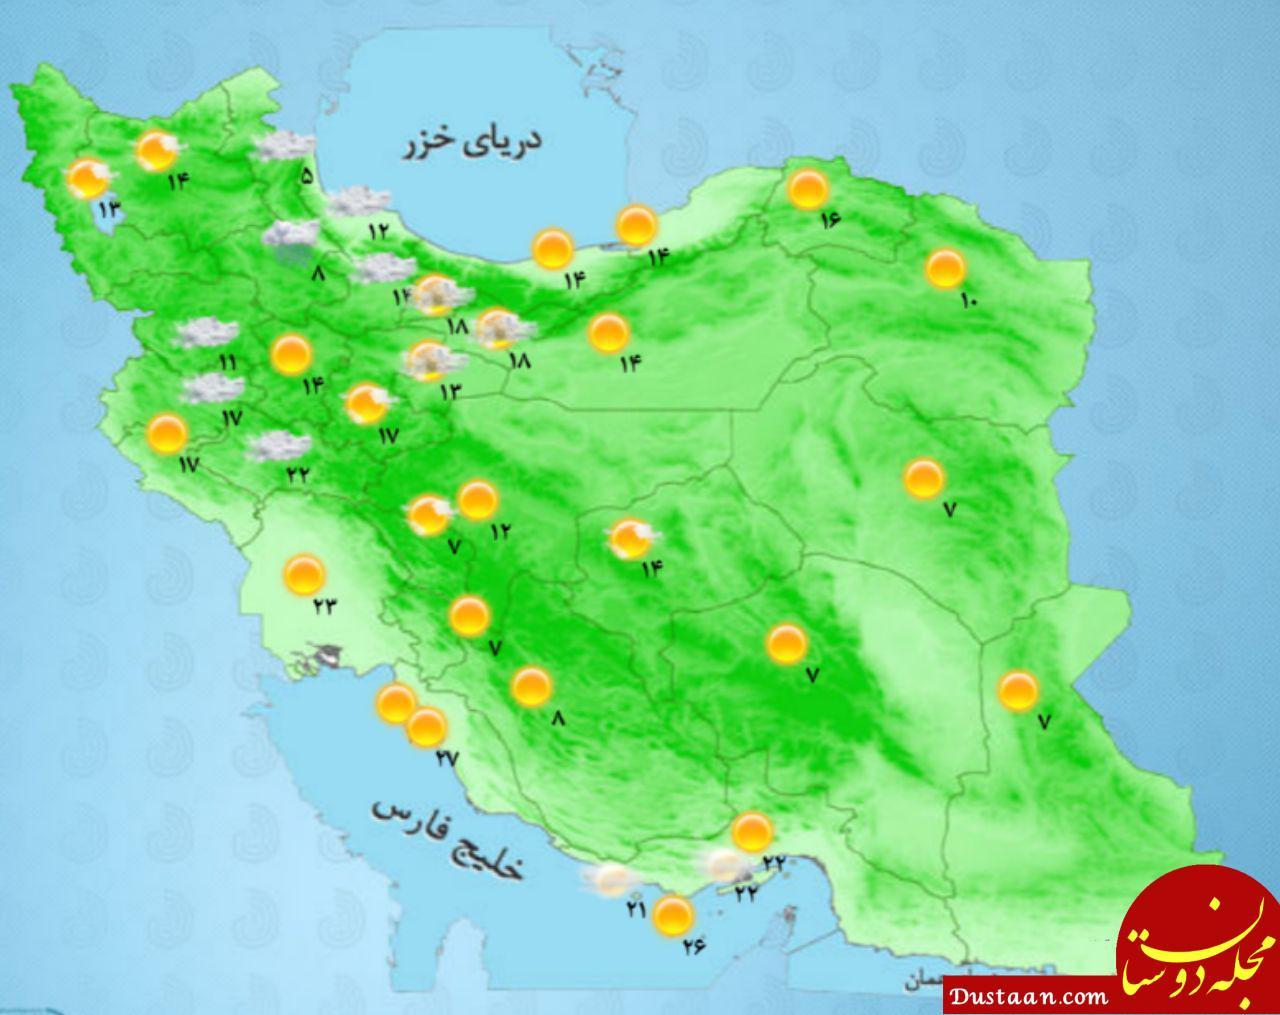 www.dustaan.com شنبه 1 اردیبهشت / دمای مراکز استان های کشور +نقشه